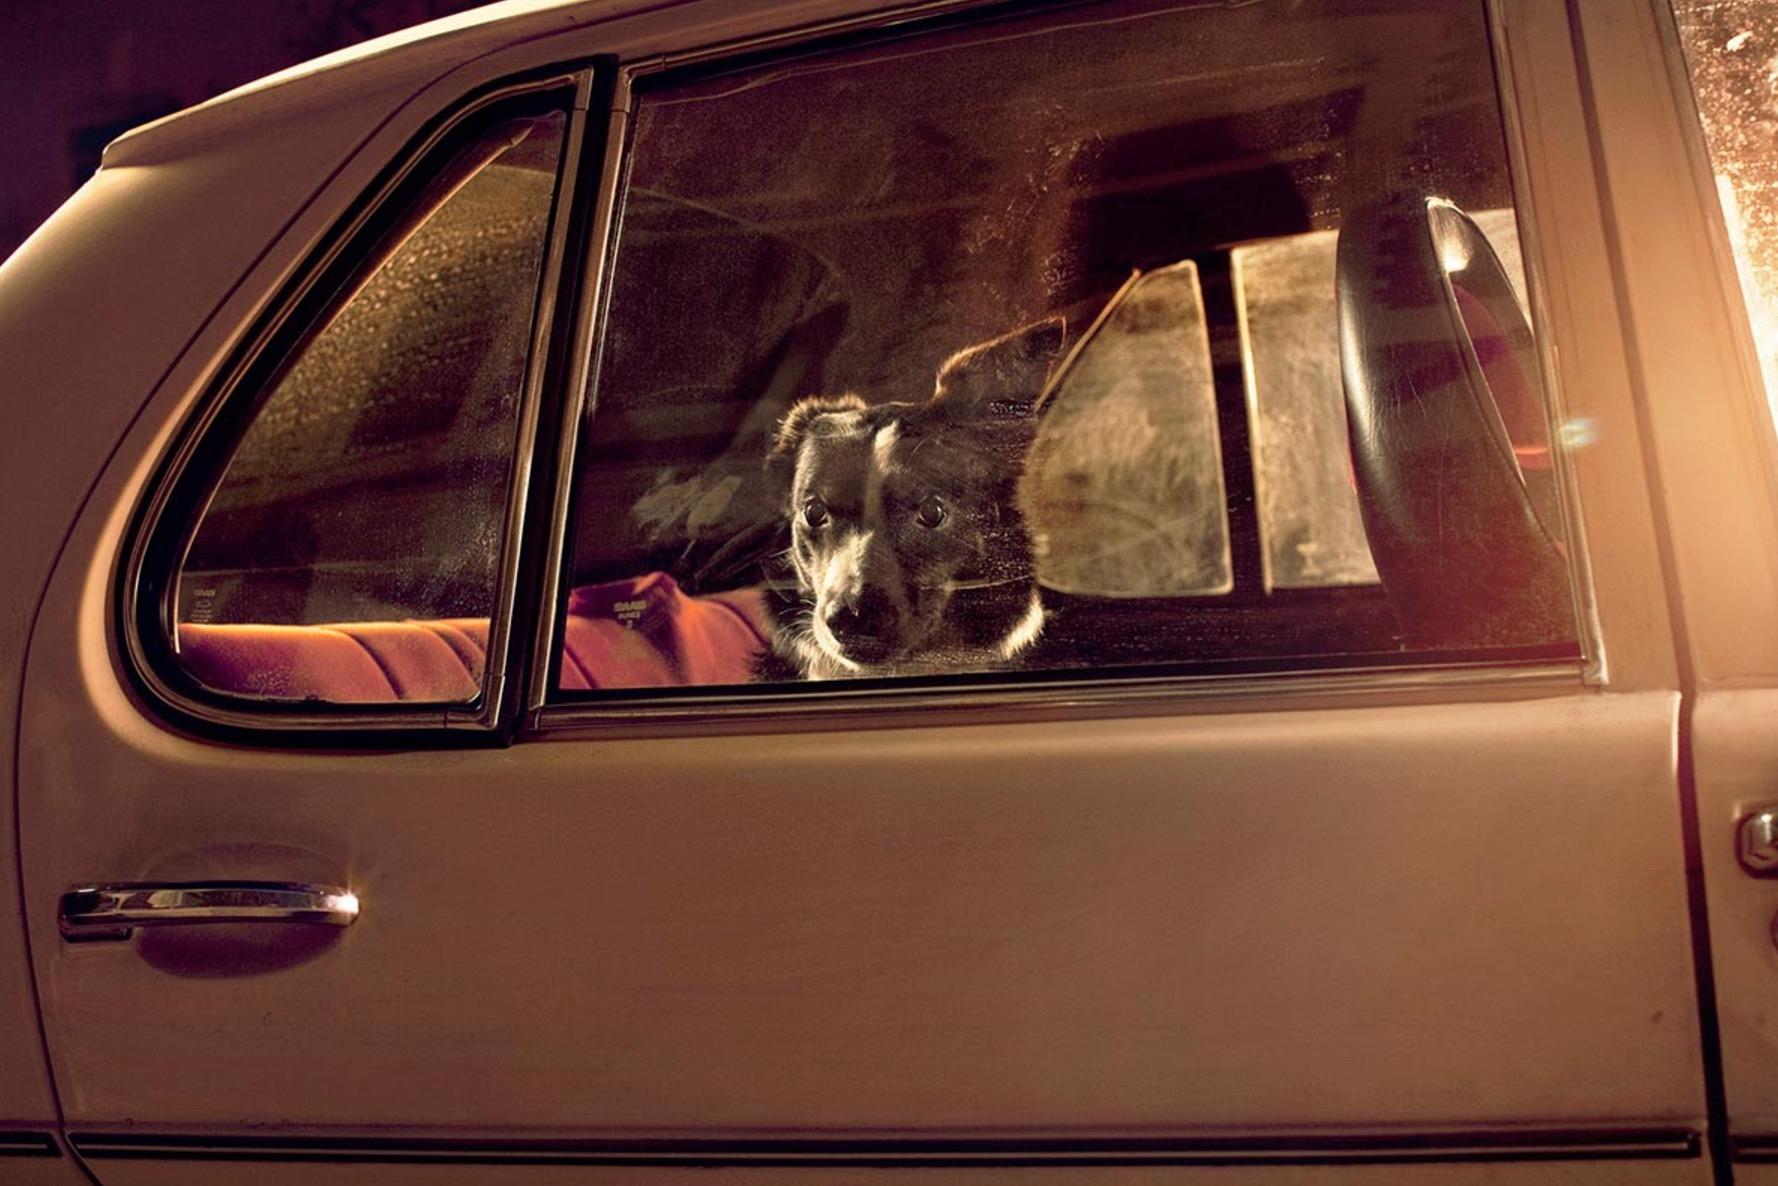 Martin-Usborne-photographe-chiens-voitures-5